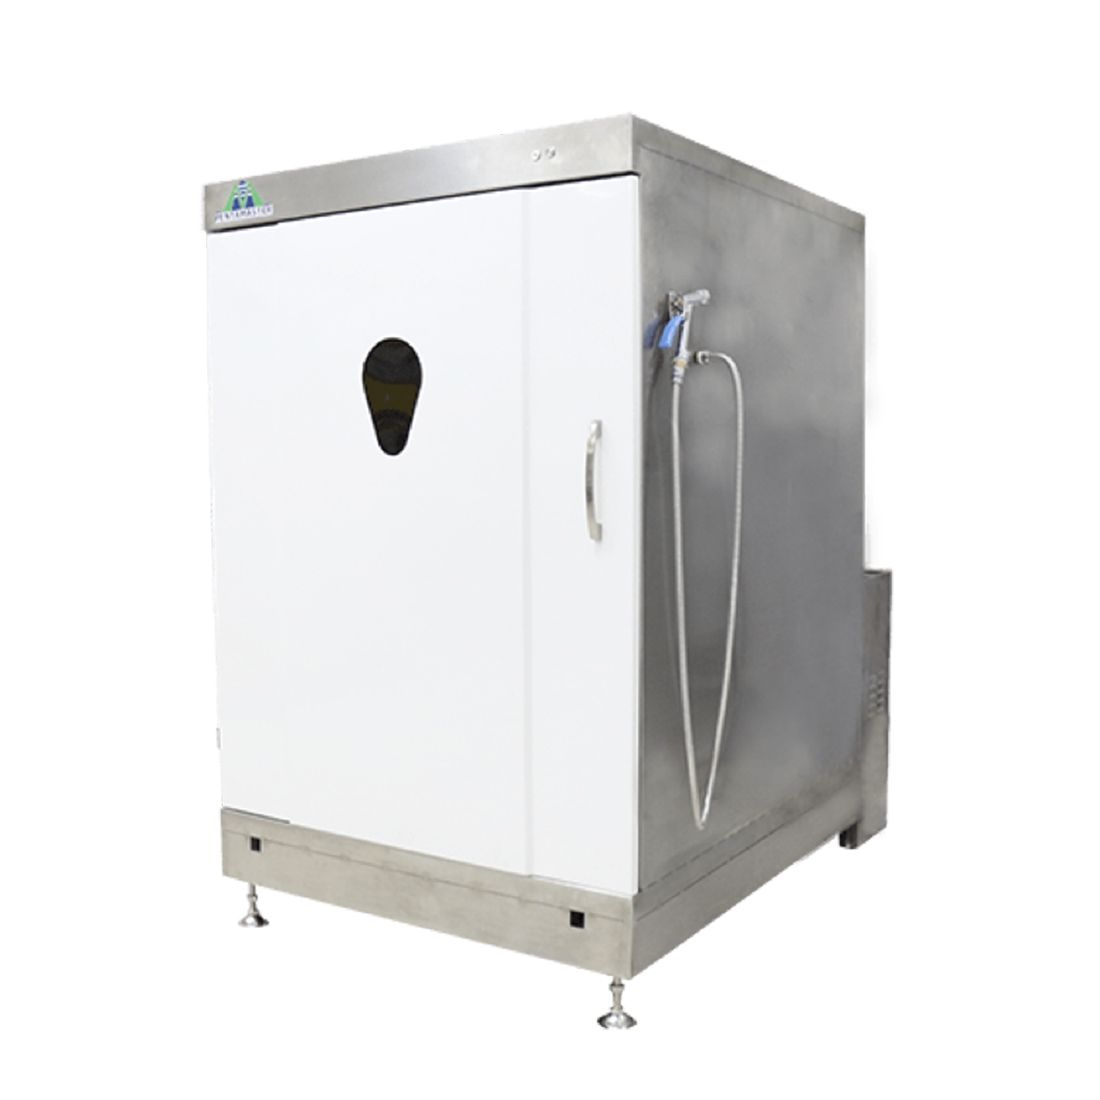 Pentamaster Hygiene Washer